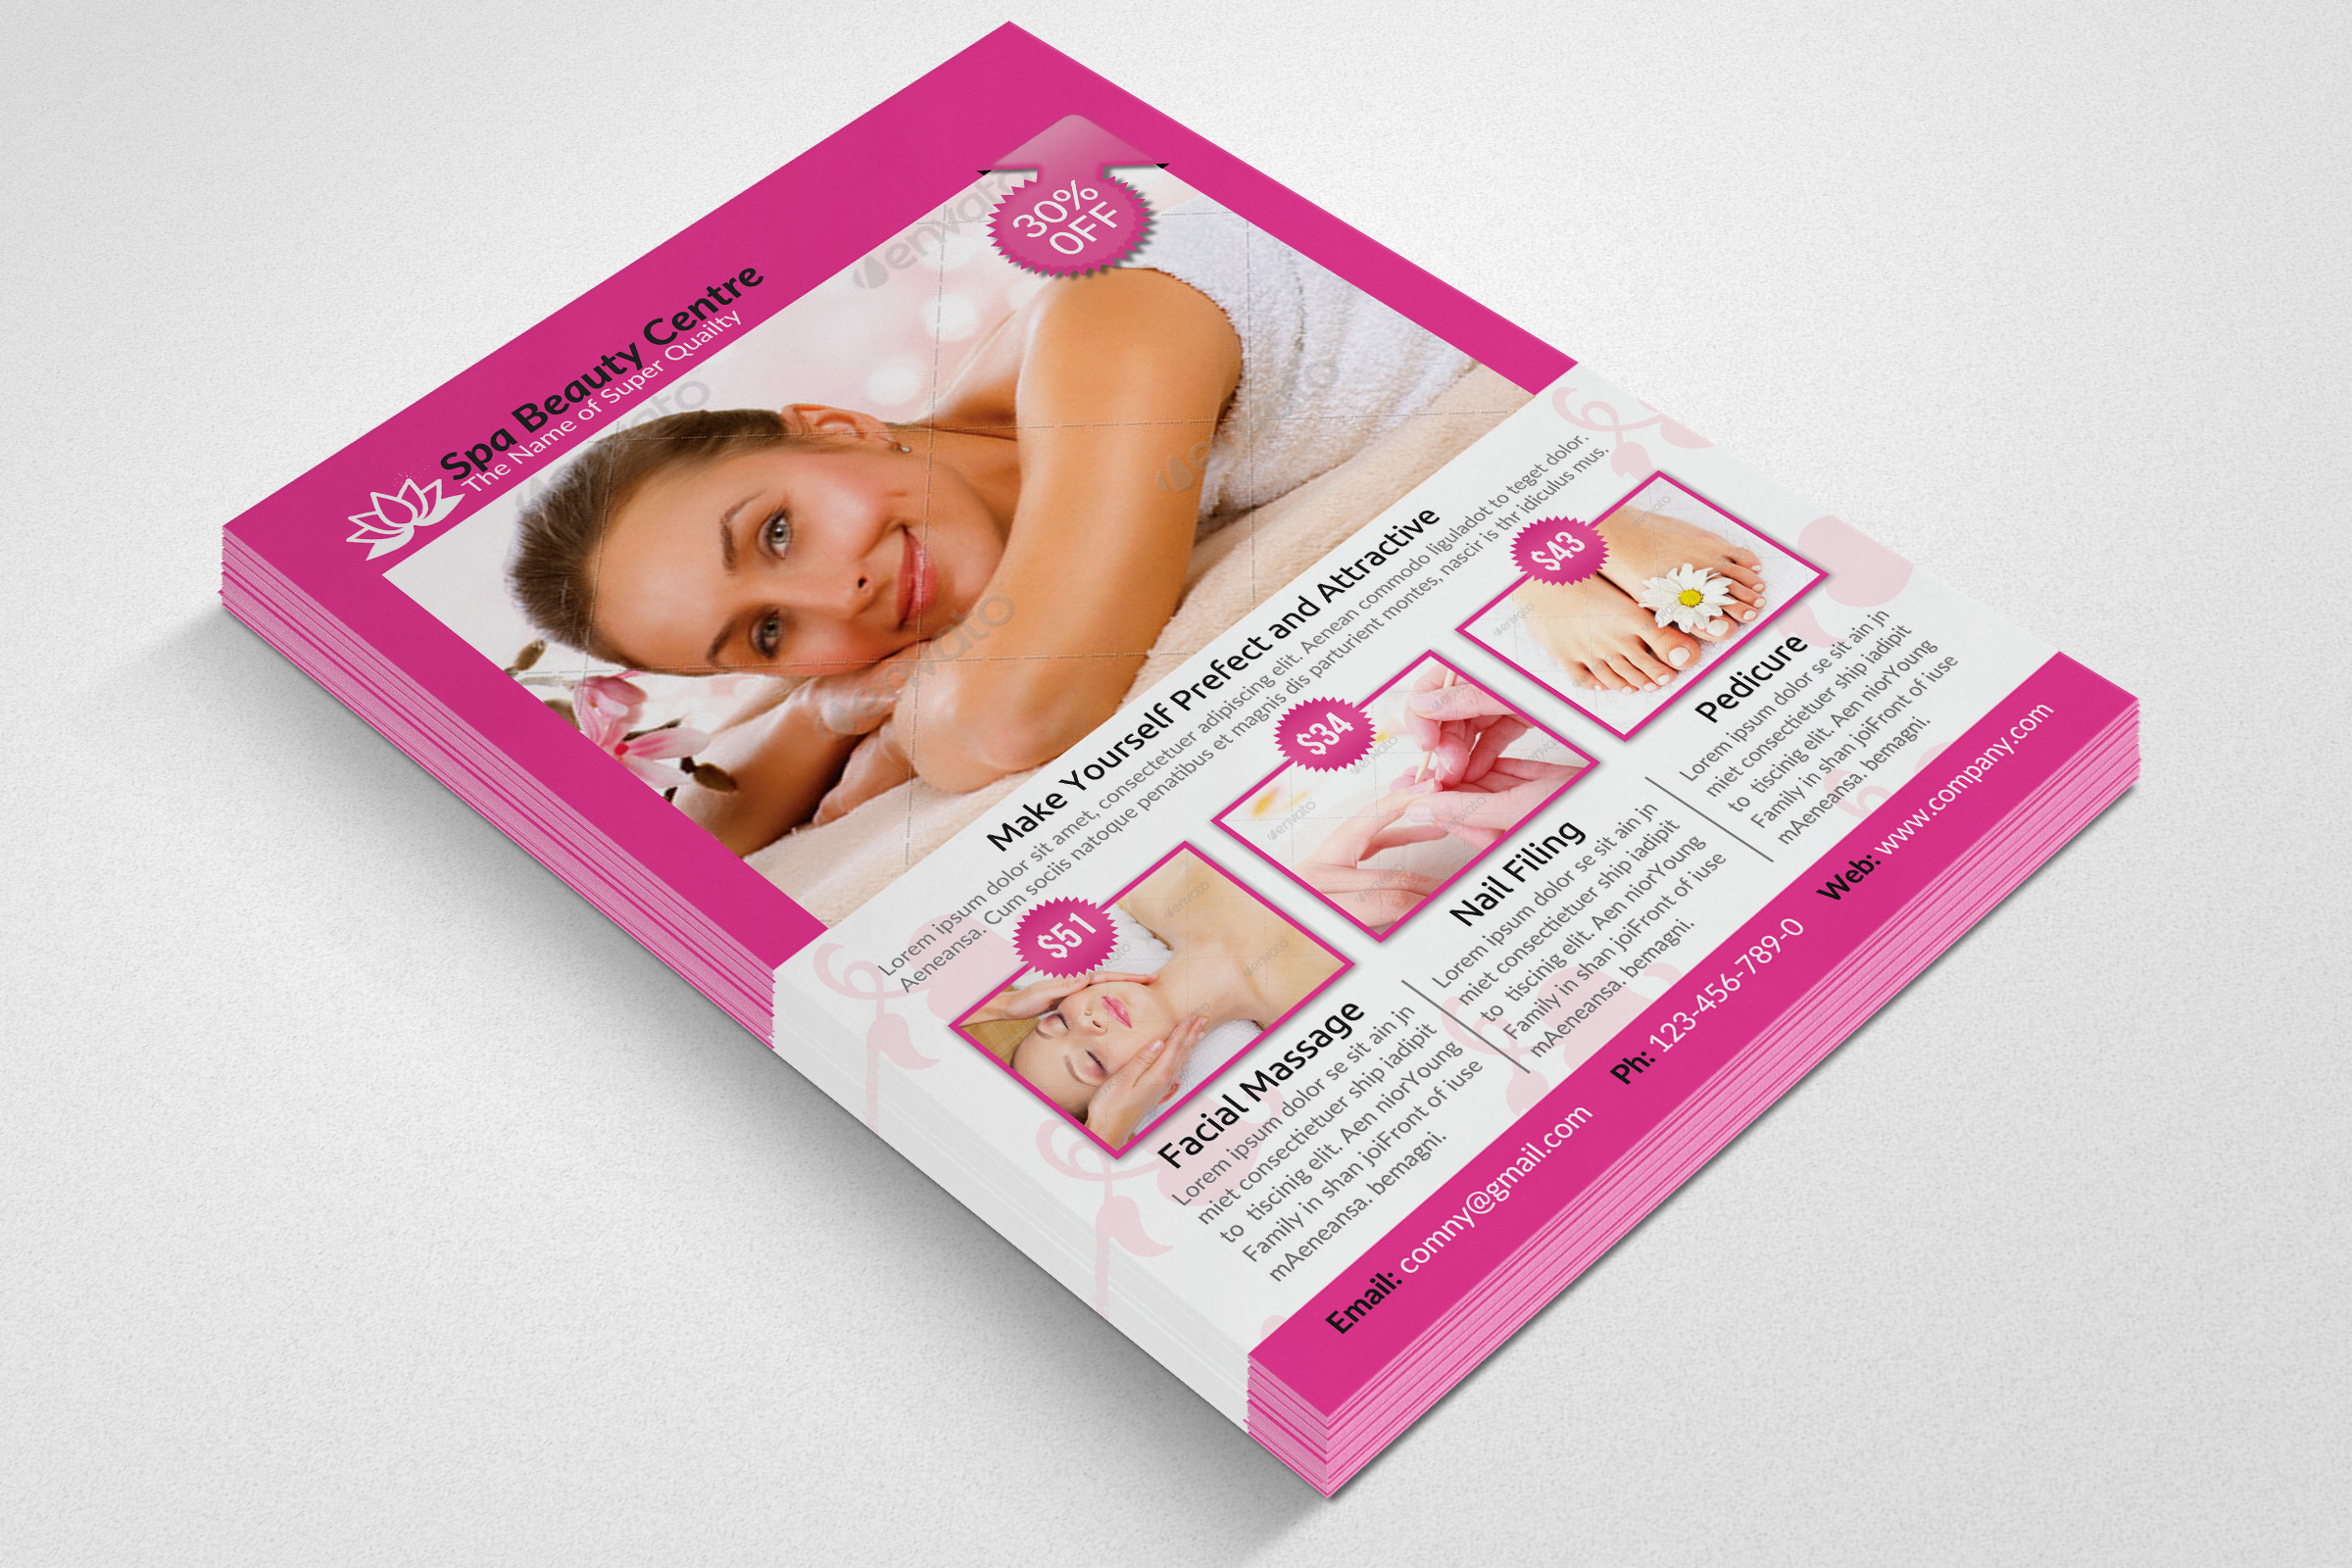 Beauty Spa & Massage Flyer example image 3